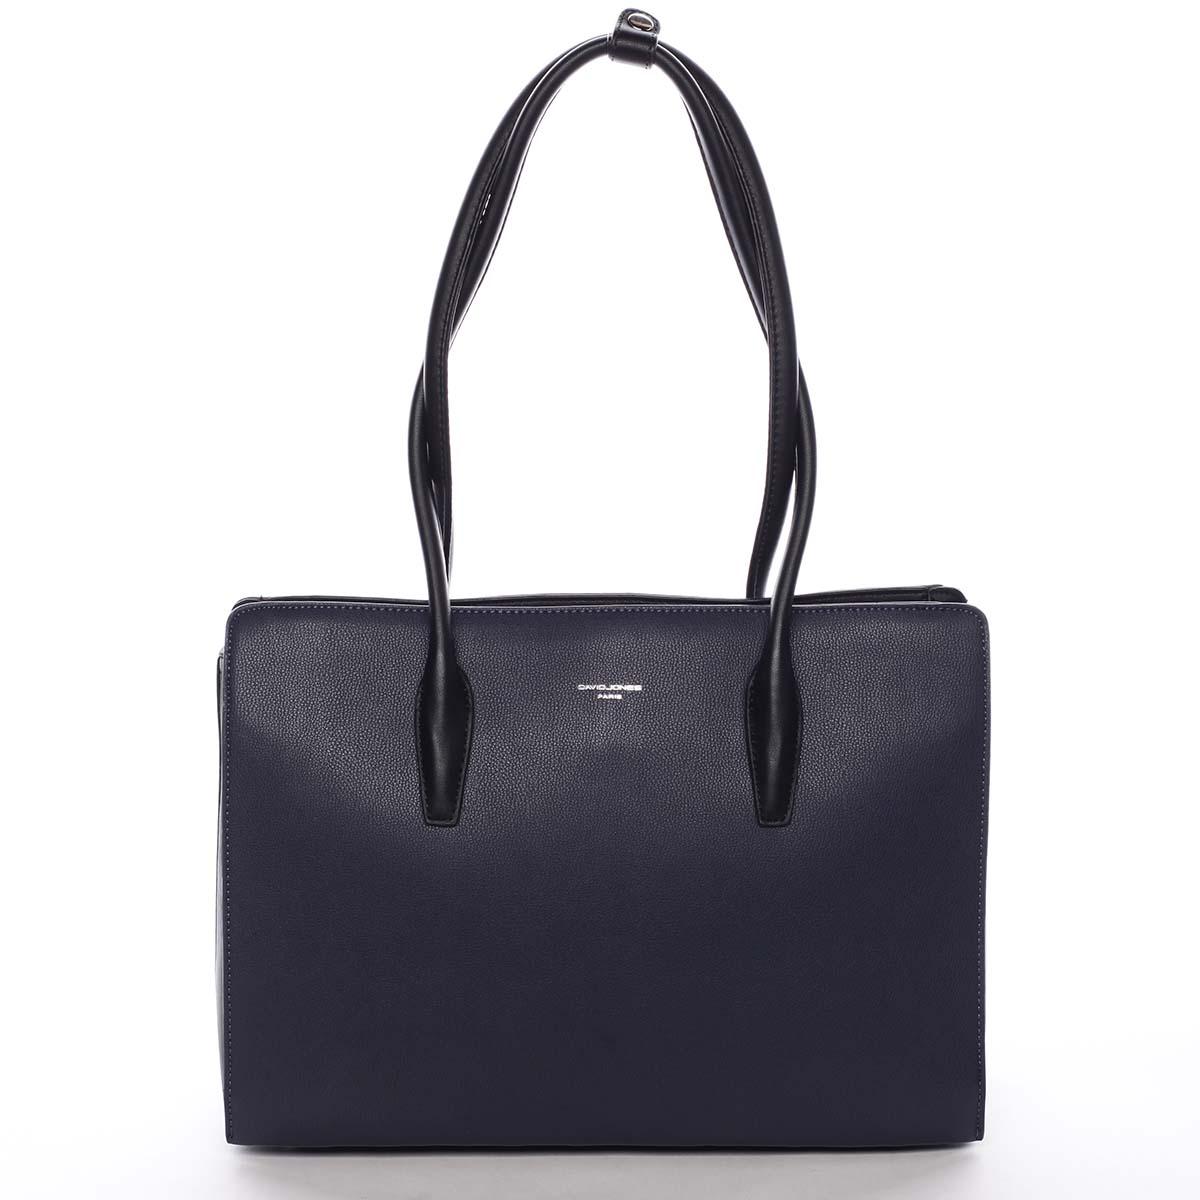 Velká dámská kabelka přes rameno tmavě modrá - David Jones Adalgisa